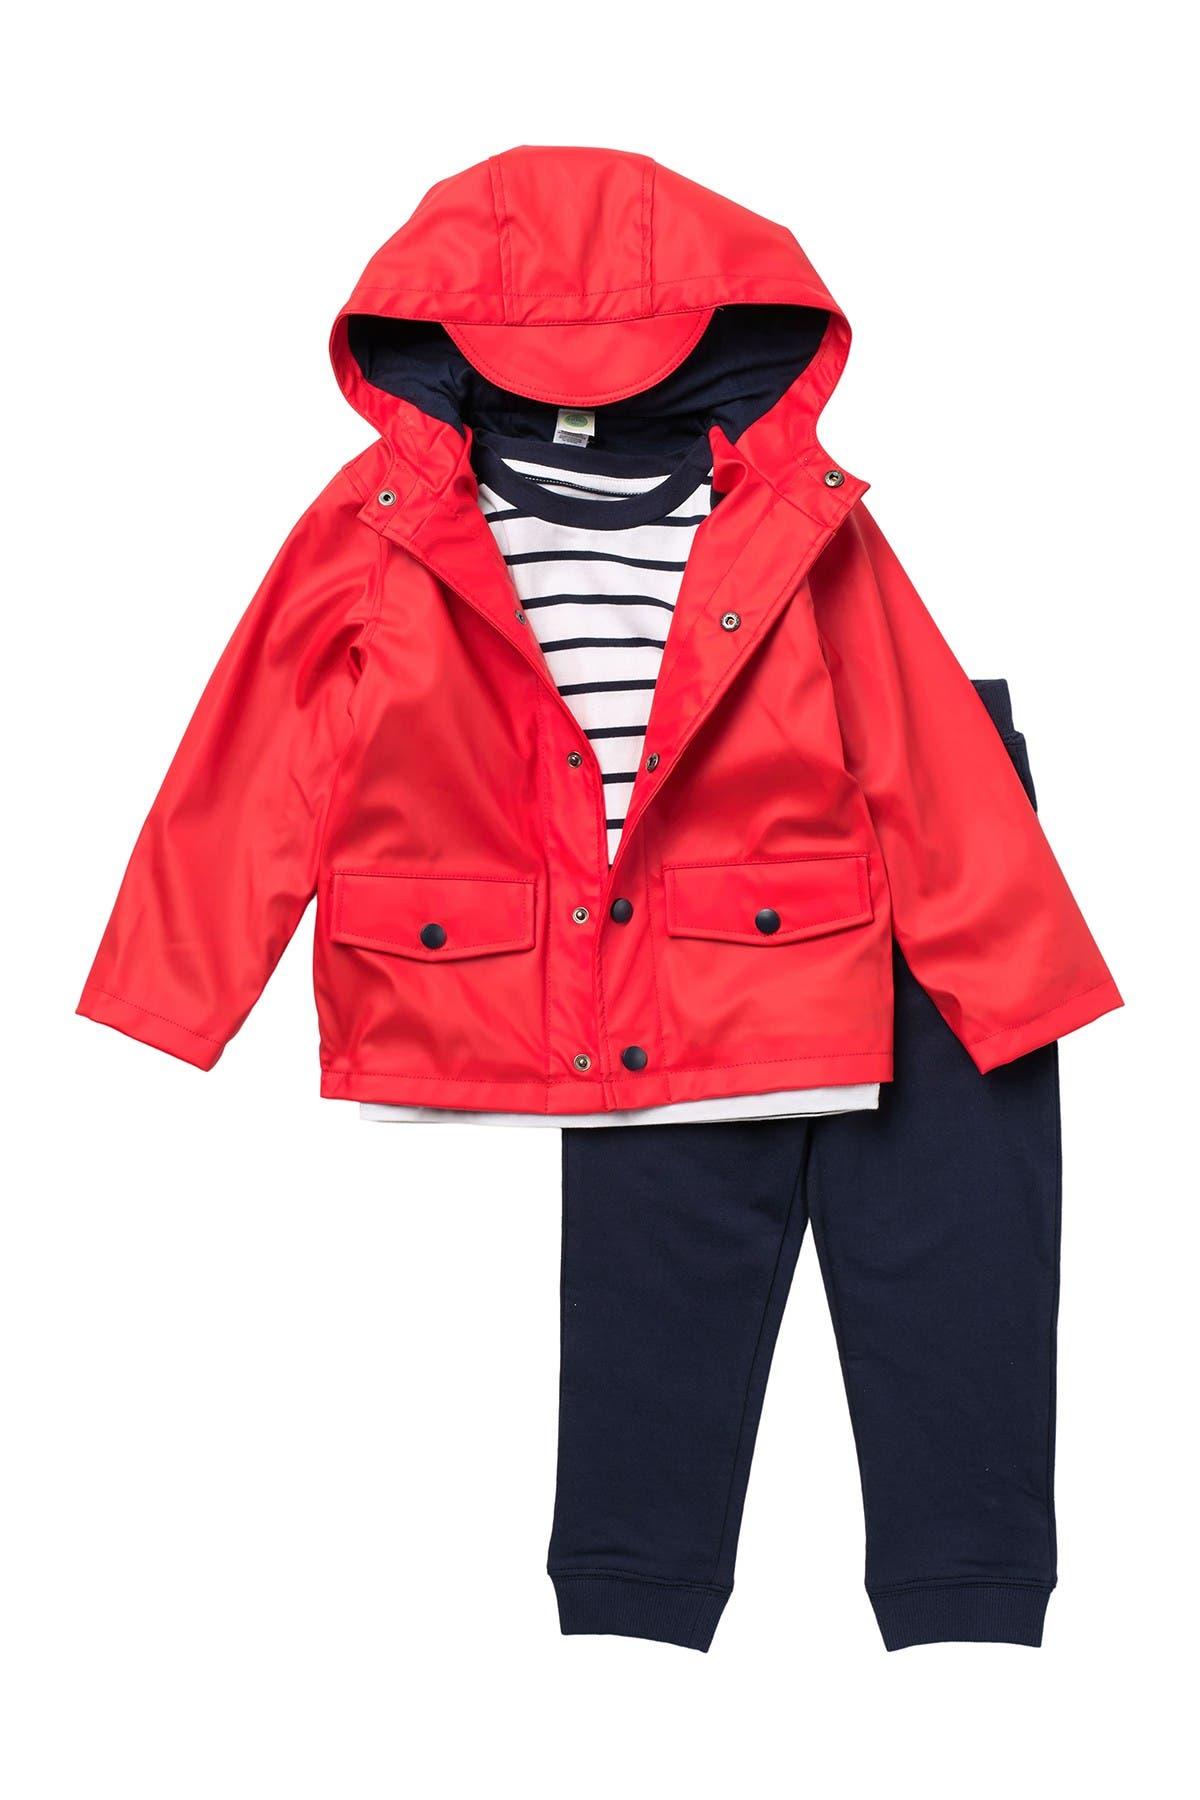 Image of Little Me Jacket, Tee, & Joggers 3-Piece Set